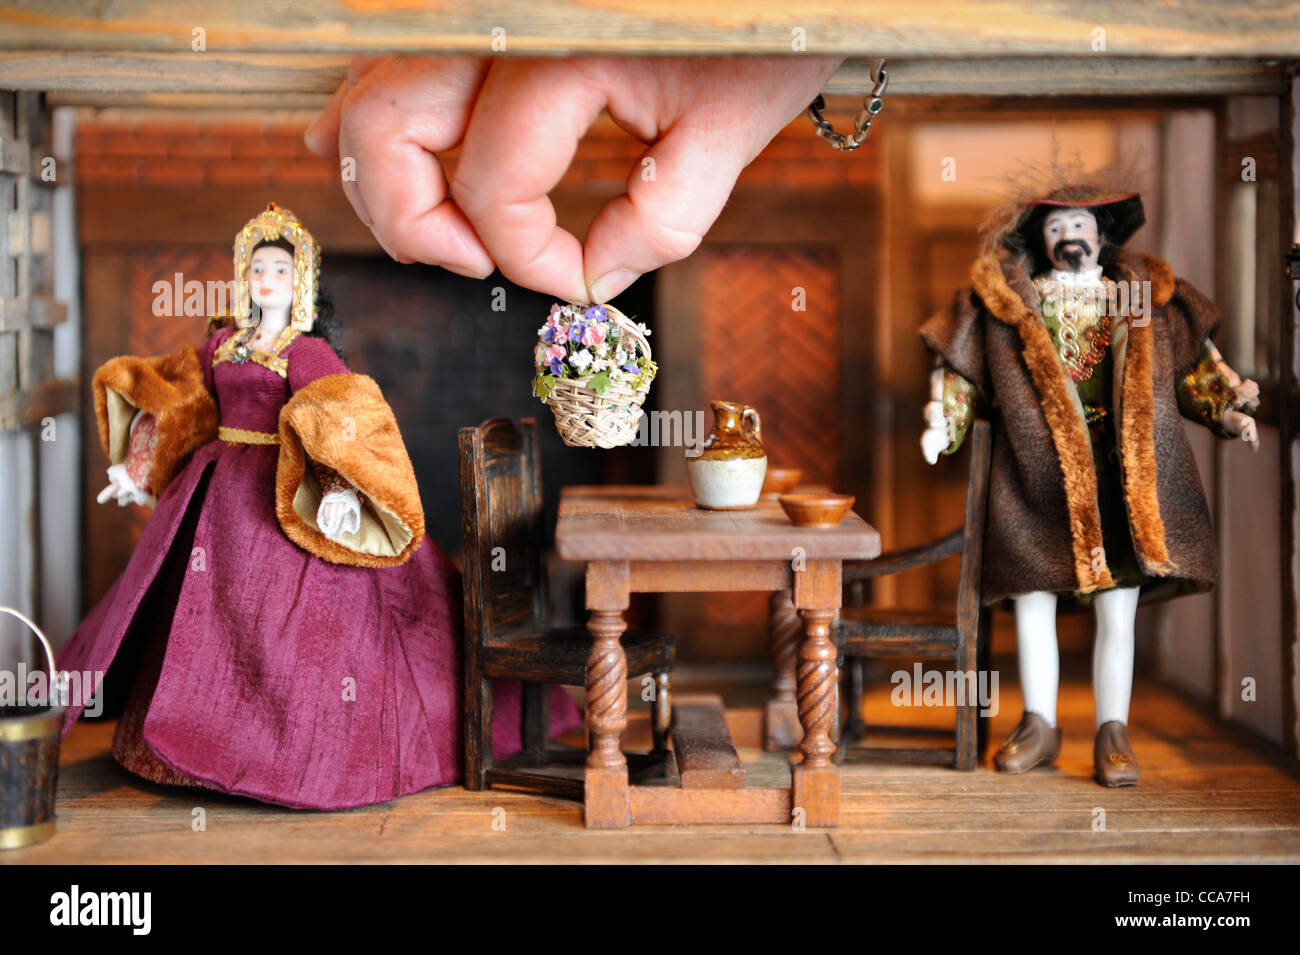 Kit Meggitt arranges items in her Tudor Aristocrats Solar Room displayed at 'Miniatura' - the dolls house - Stock Image